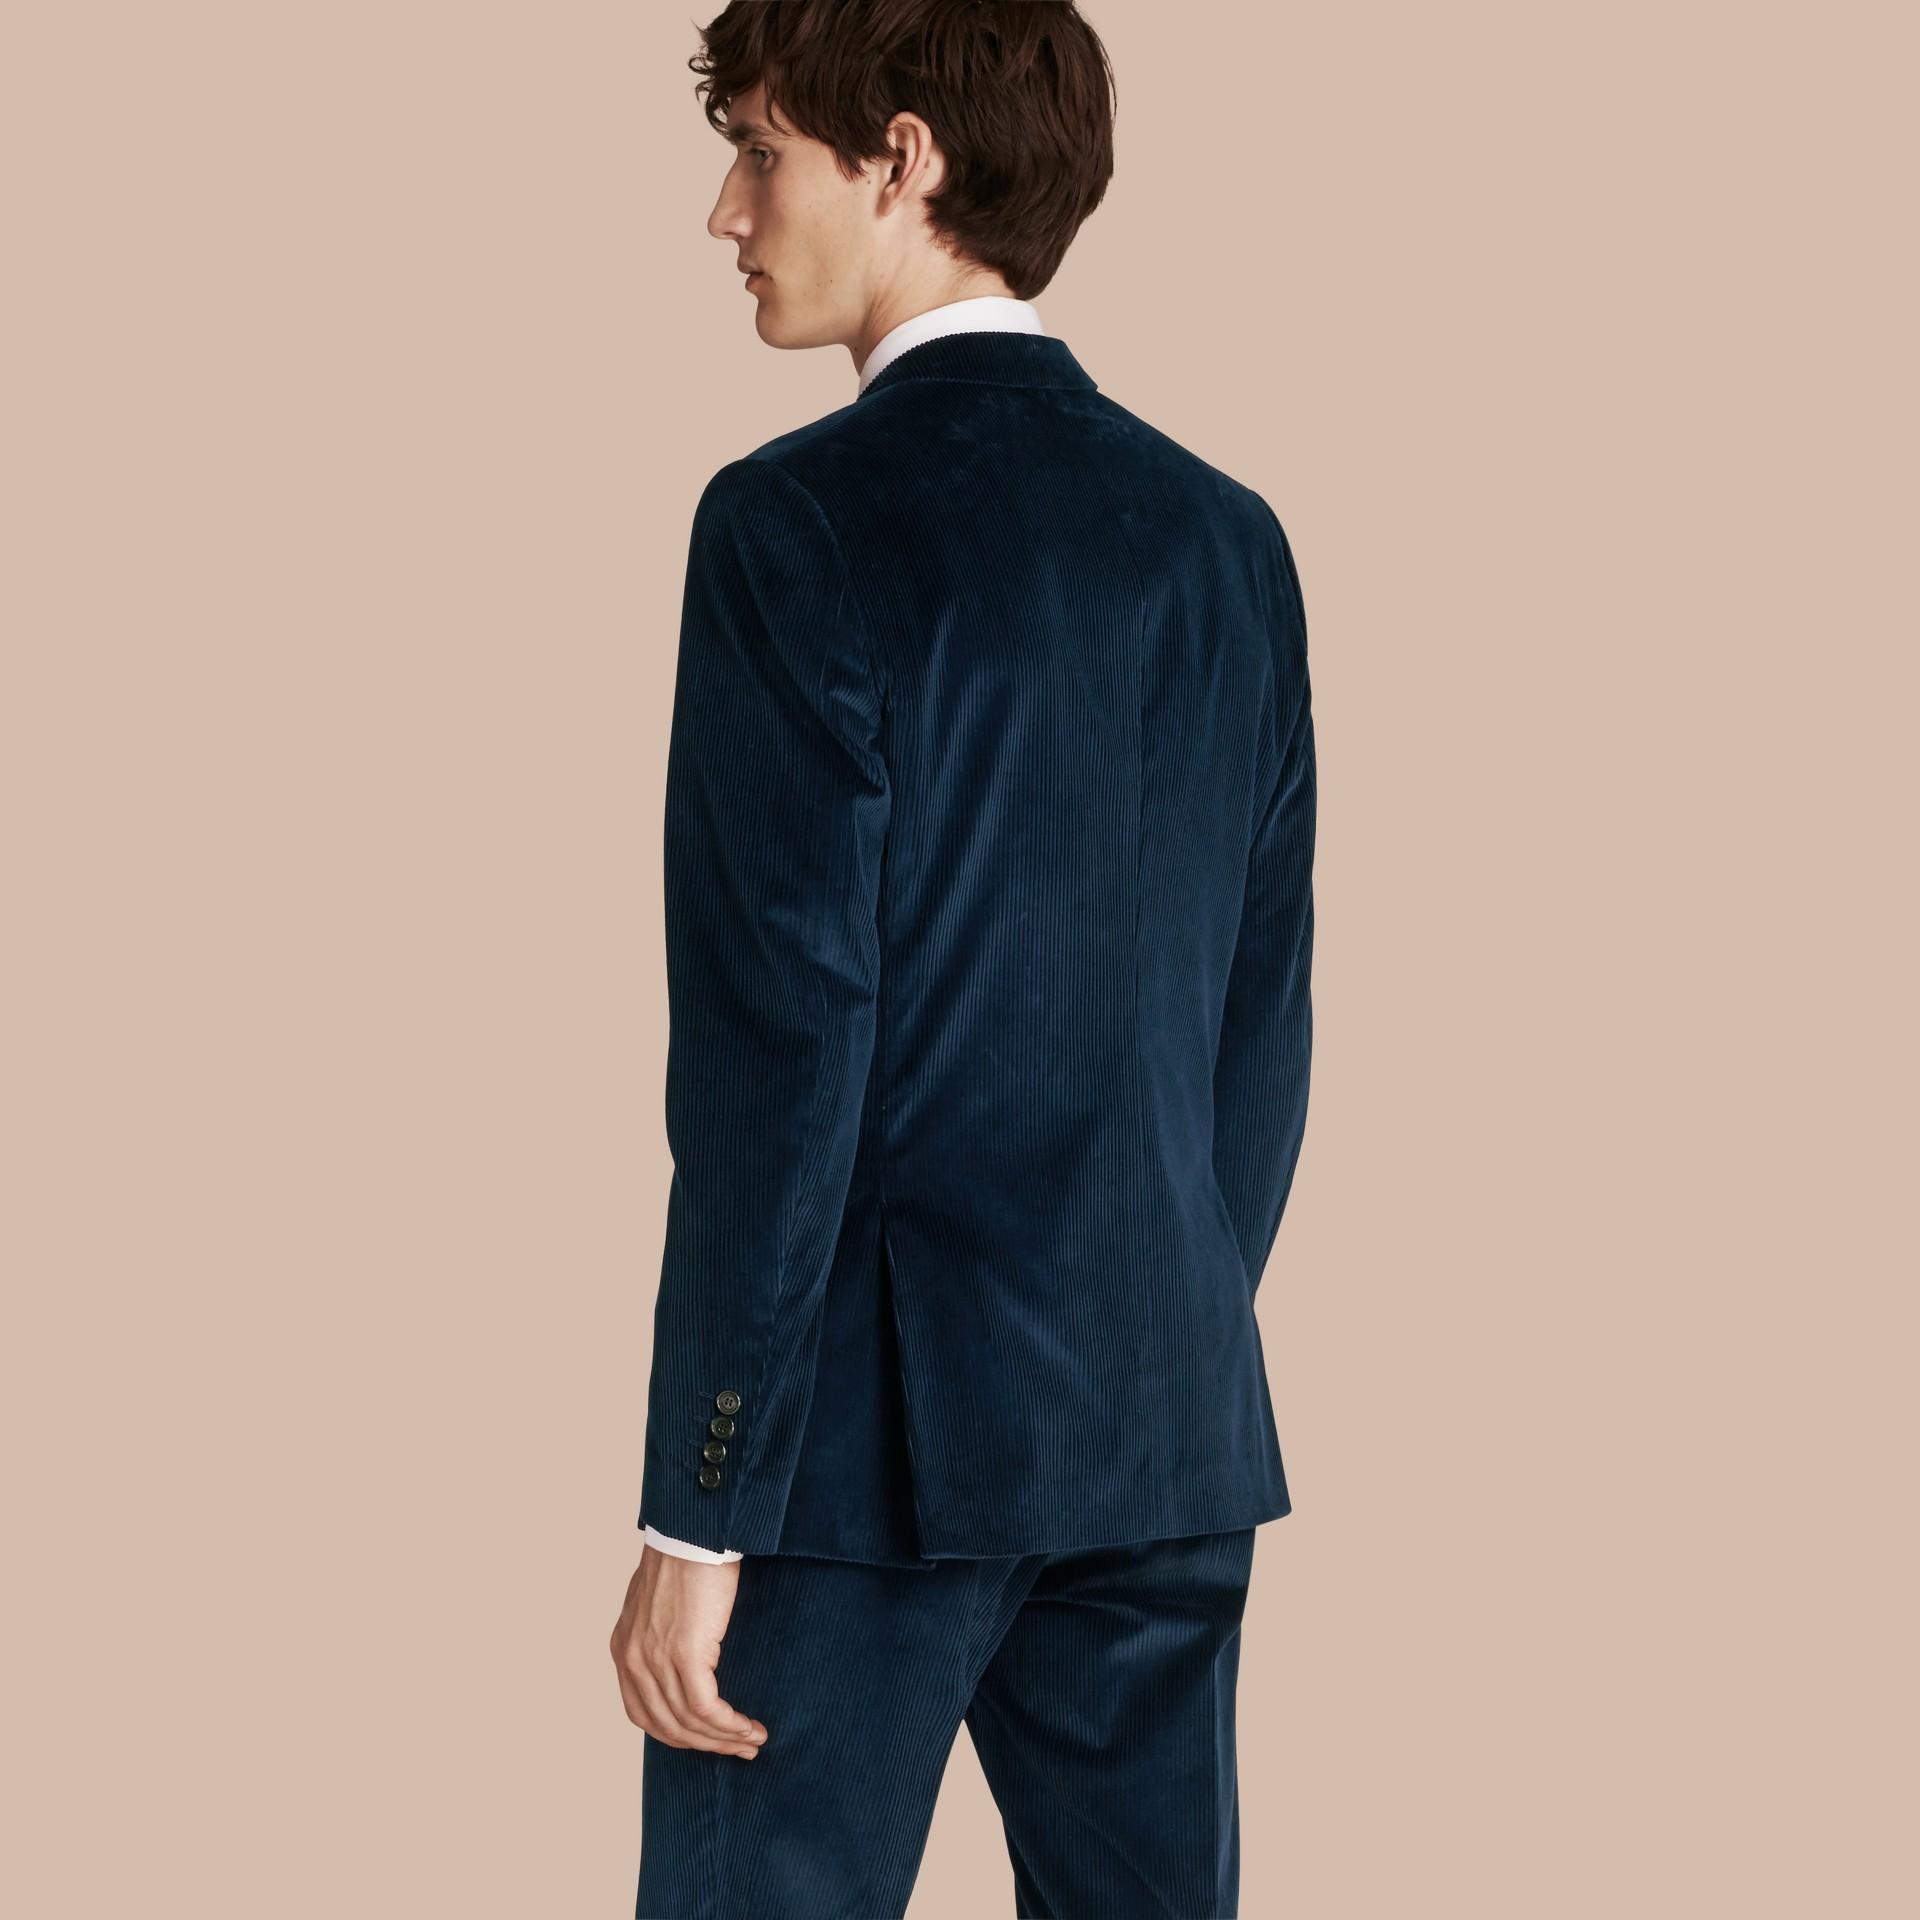 Navy Slim Fit Cotton Corduroy Jacket - gallery image 3